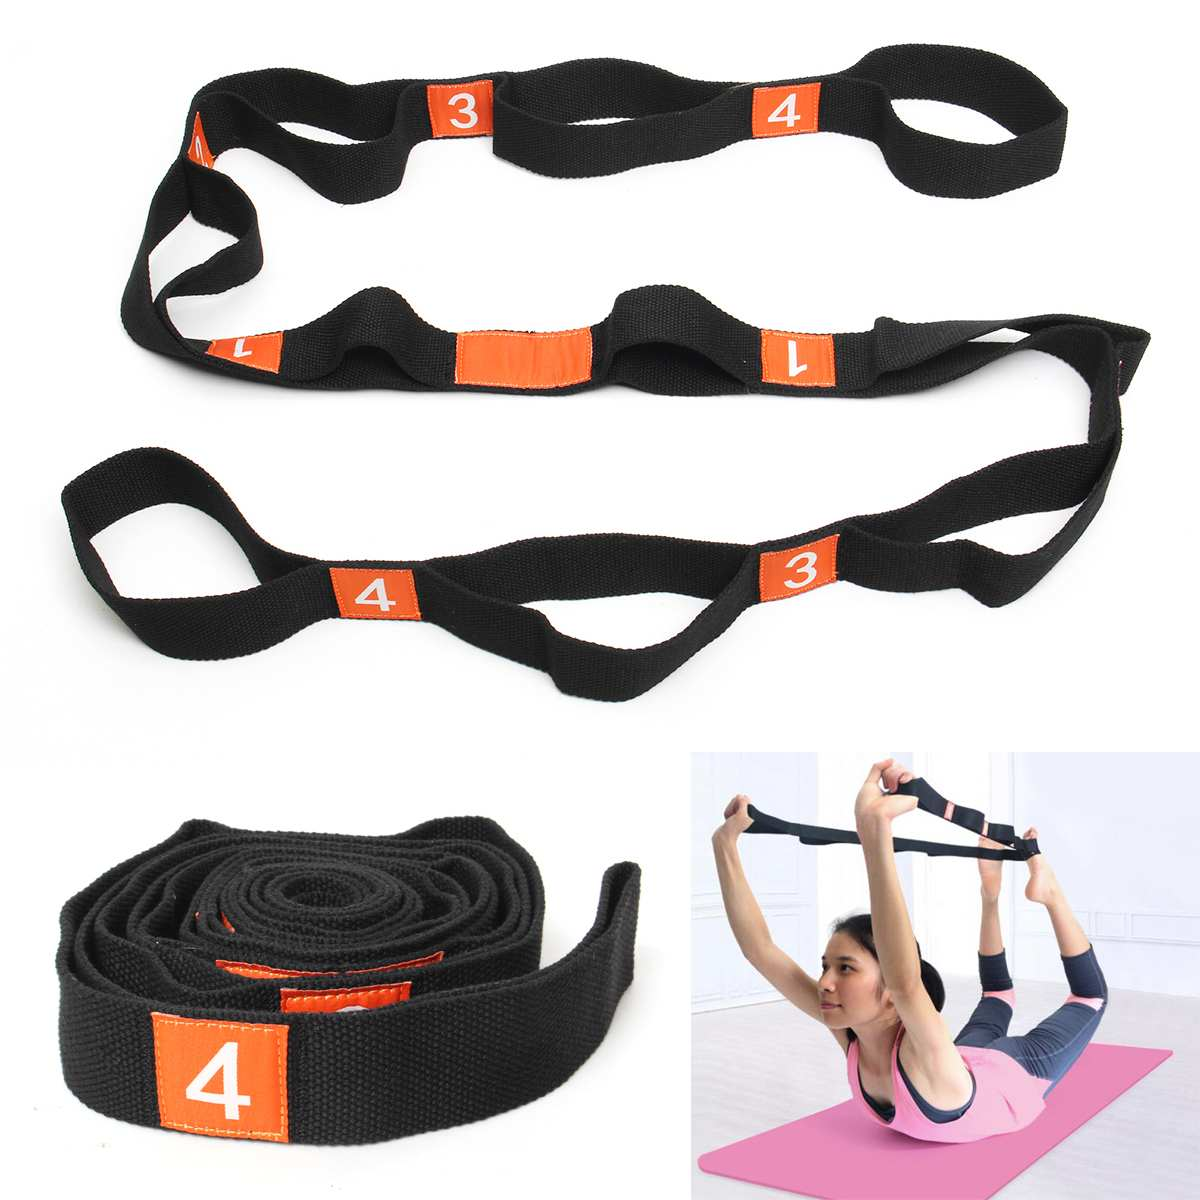 Multi-Grip Loops Yoga Stretch Strap Waist Leg Back Pilates Fitness Exercise Belt Exercise Tools